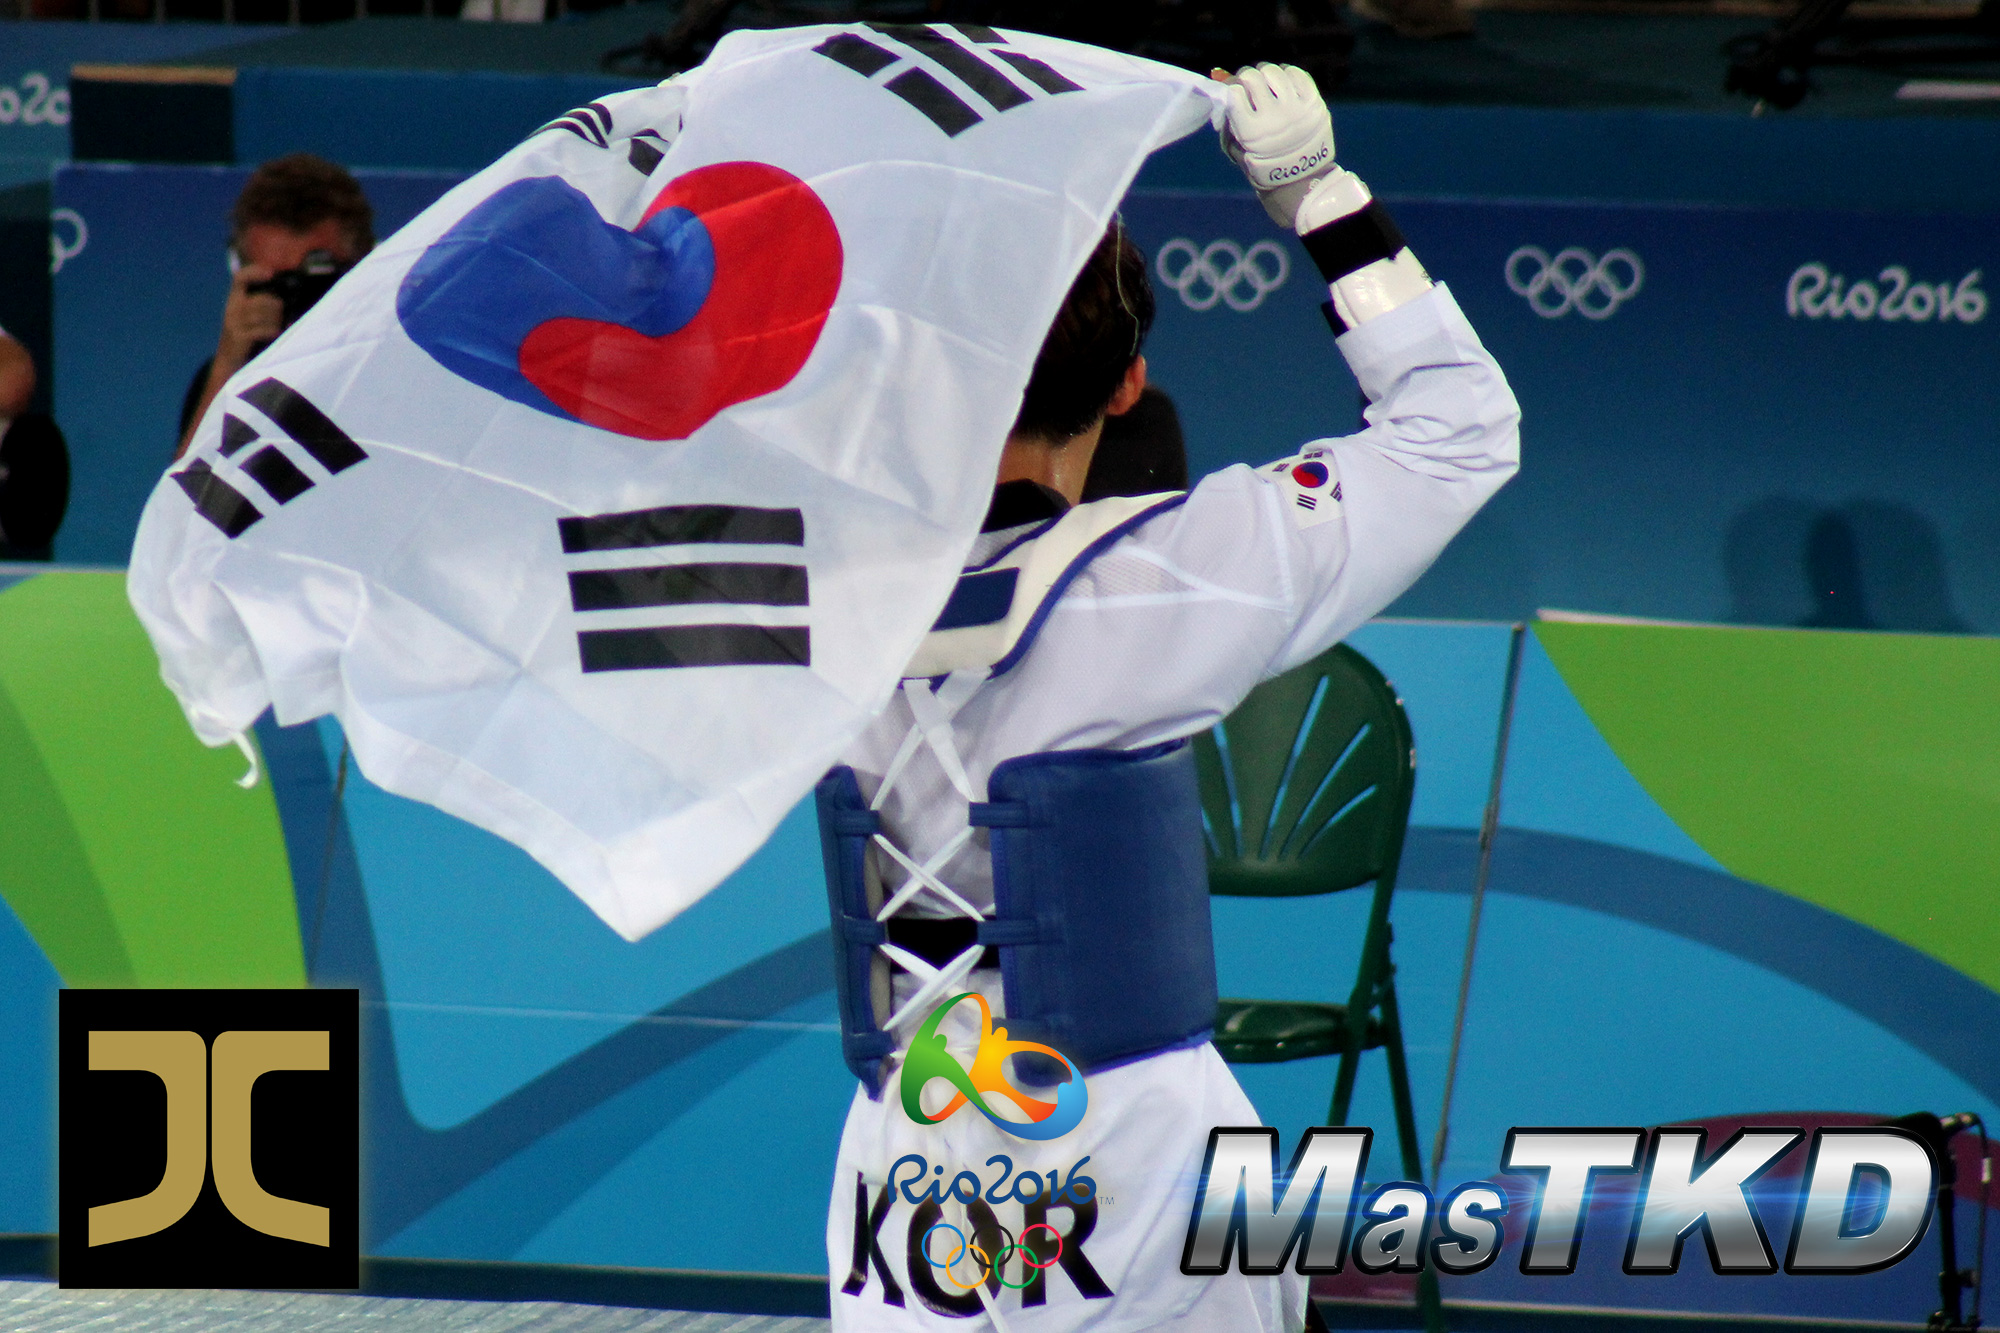 20160817_Taekwondo_JC_masTKD_Rio2016_03